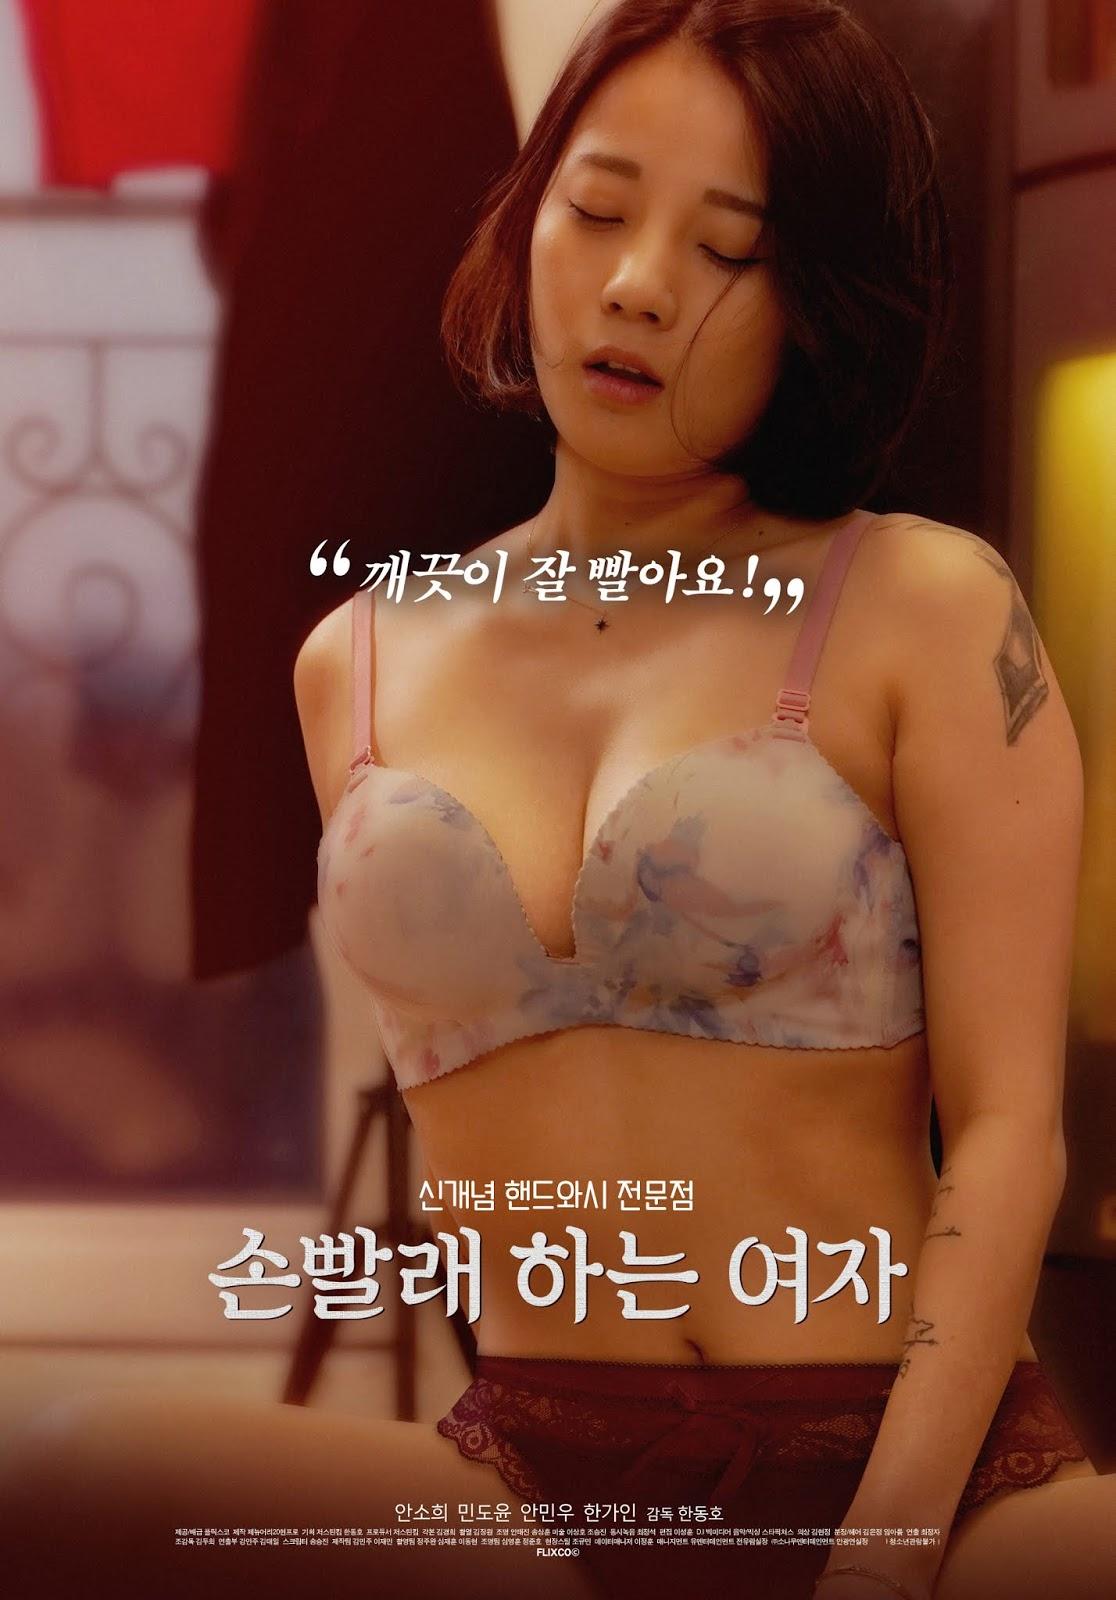 Handwashing Lady Full Korea 18+ Adult Movie Online Free